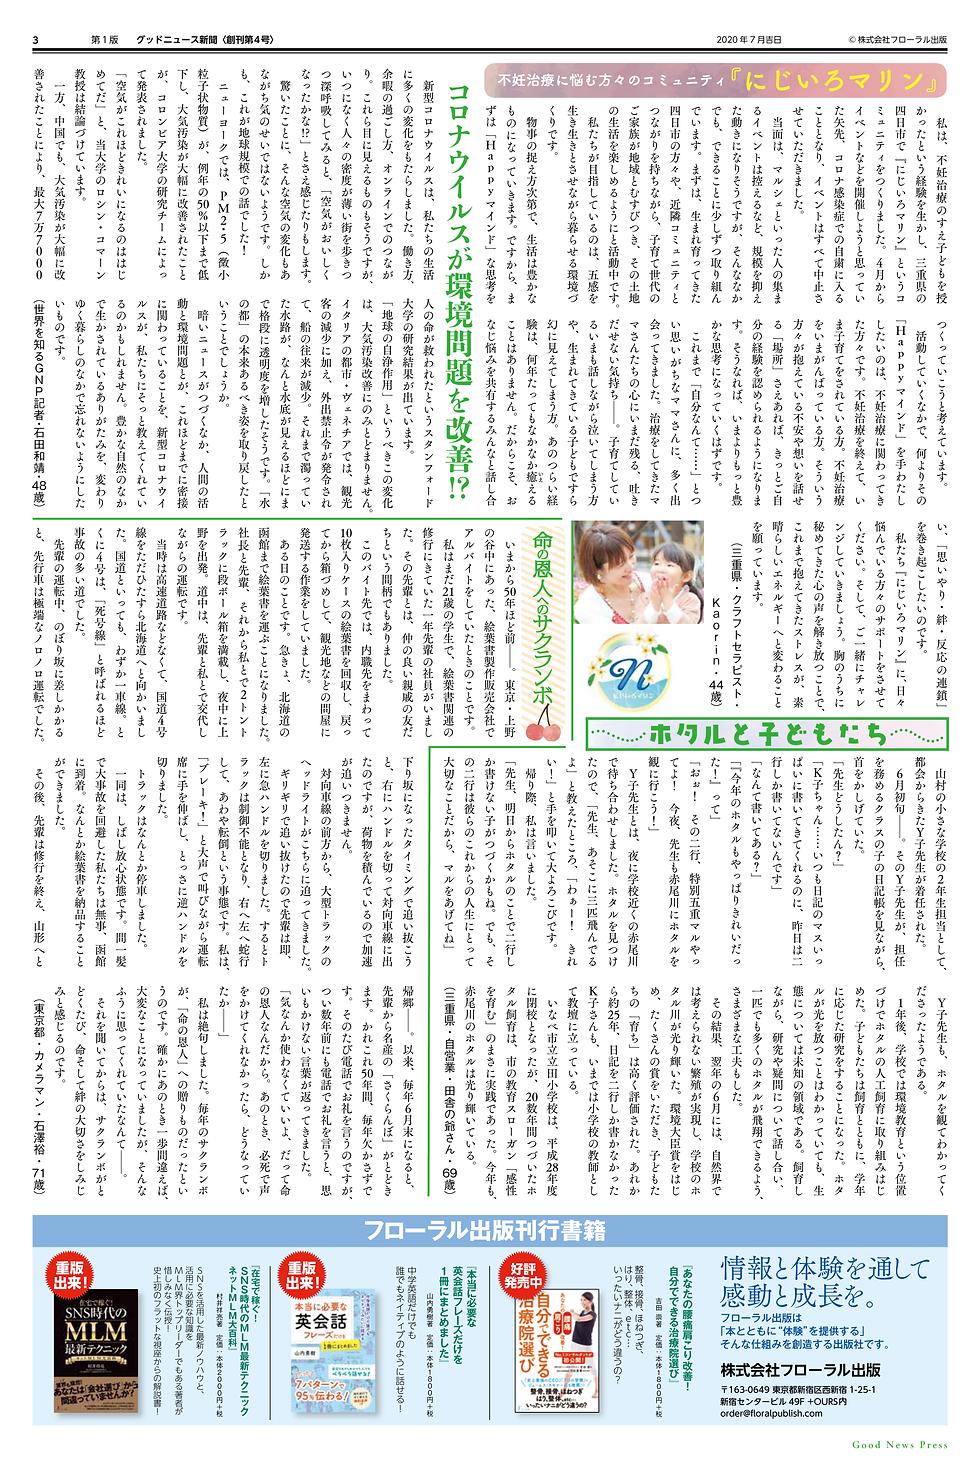 GNP4go-webyo_ページ_3.png